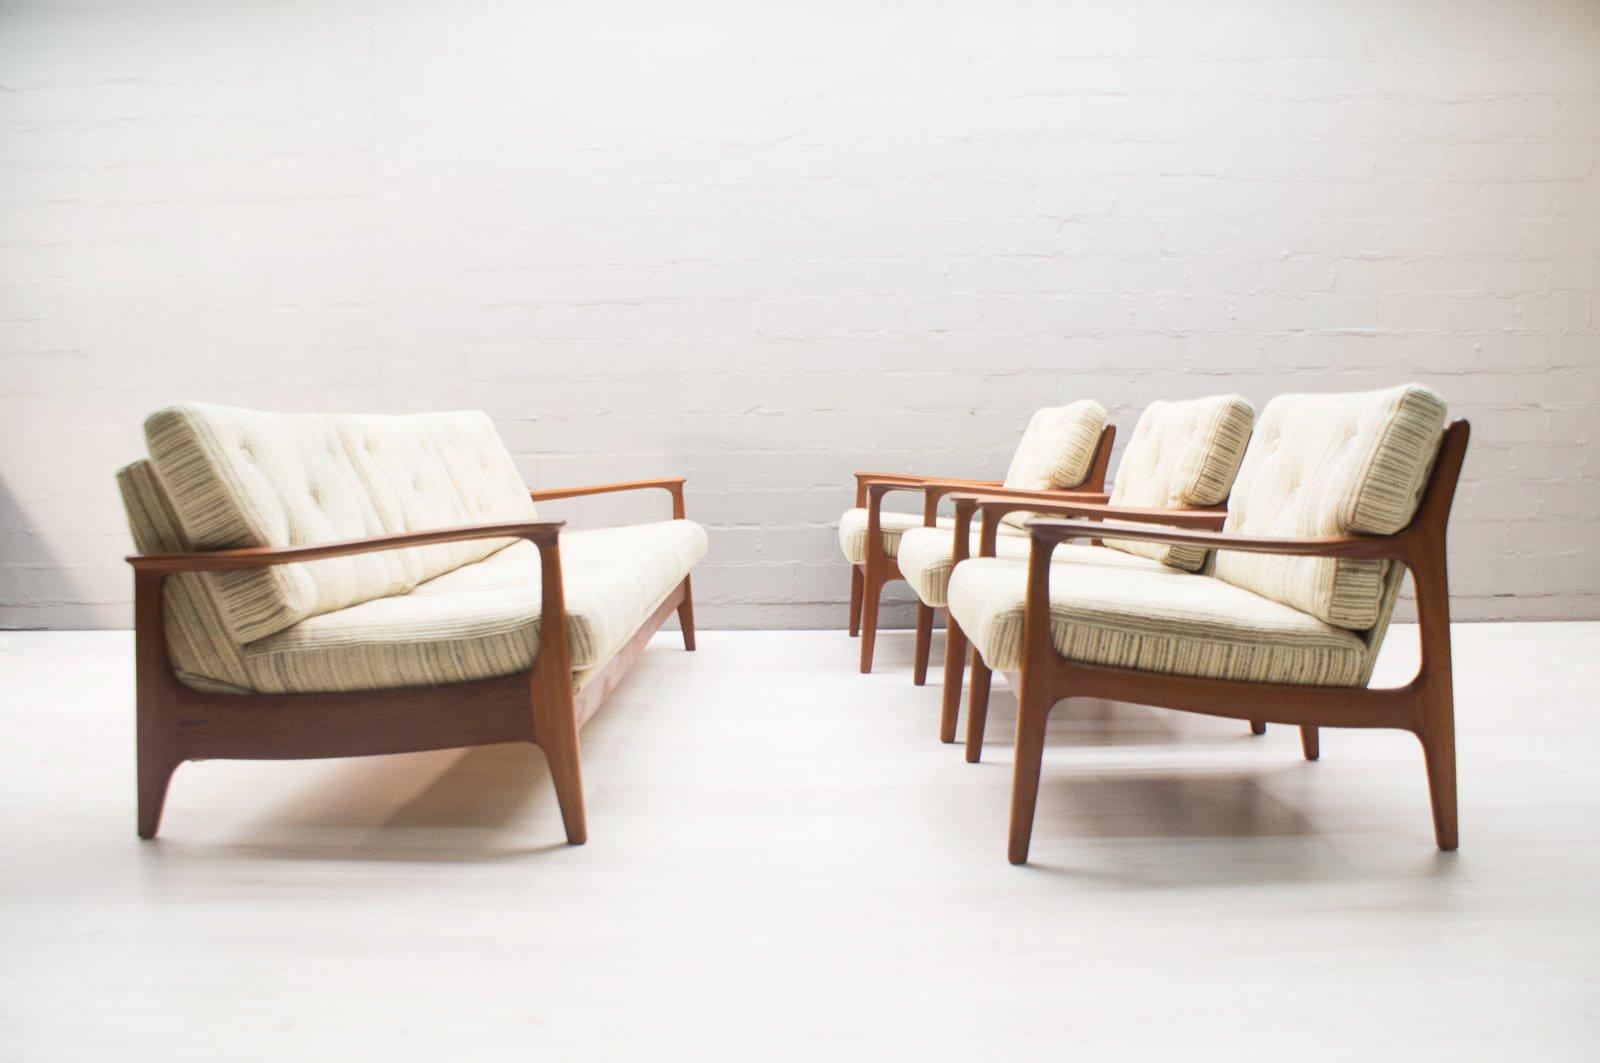 skandinavisches vintage teak sofa mit 3 sesseln bei pamono. Black Bedroom Furniture Sets. Home Design Ideas